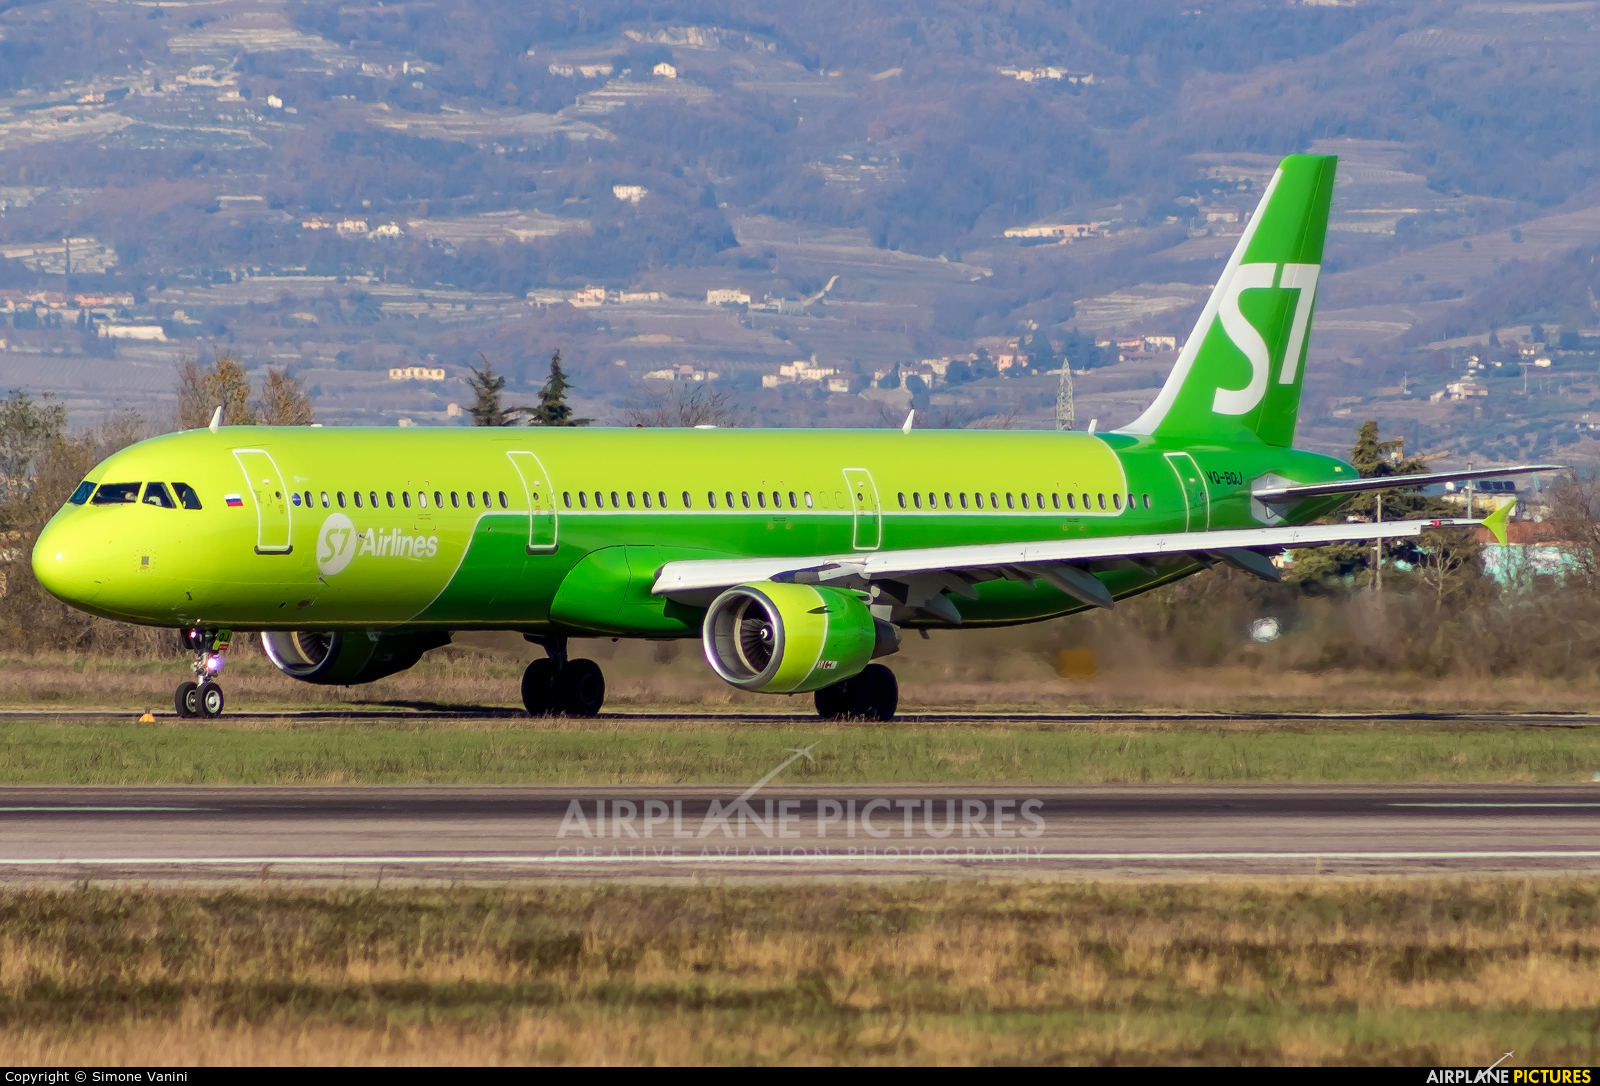 S7 Airlines VQ-BQJ aircraft at Verona - Villafranca